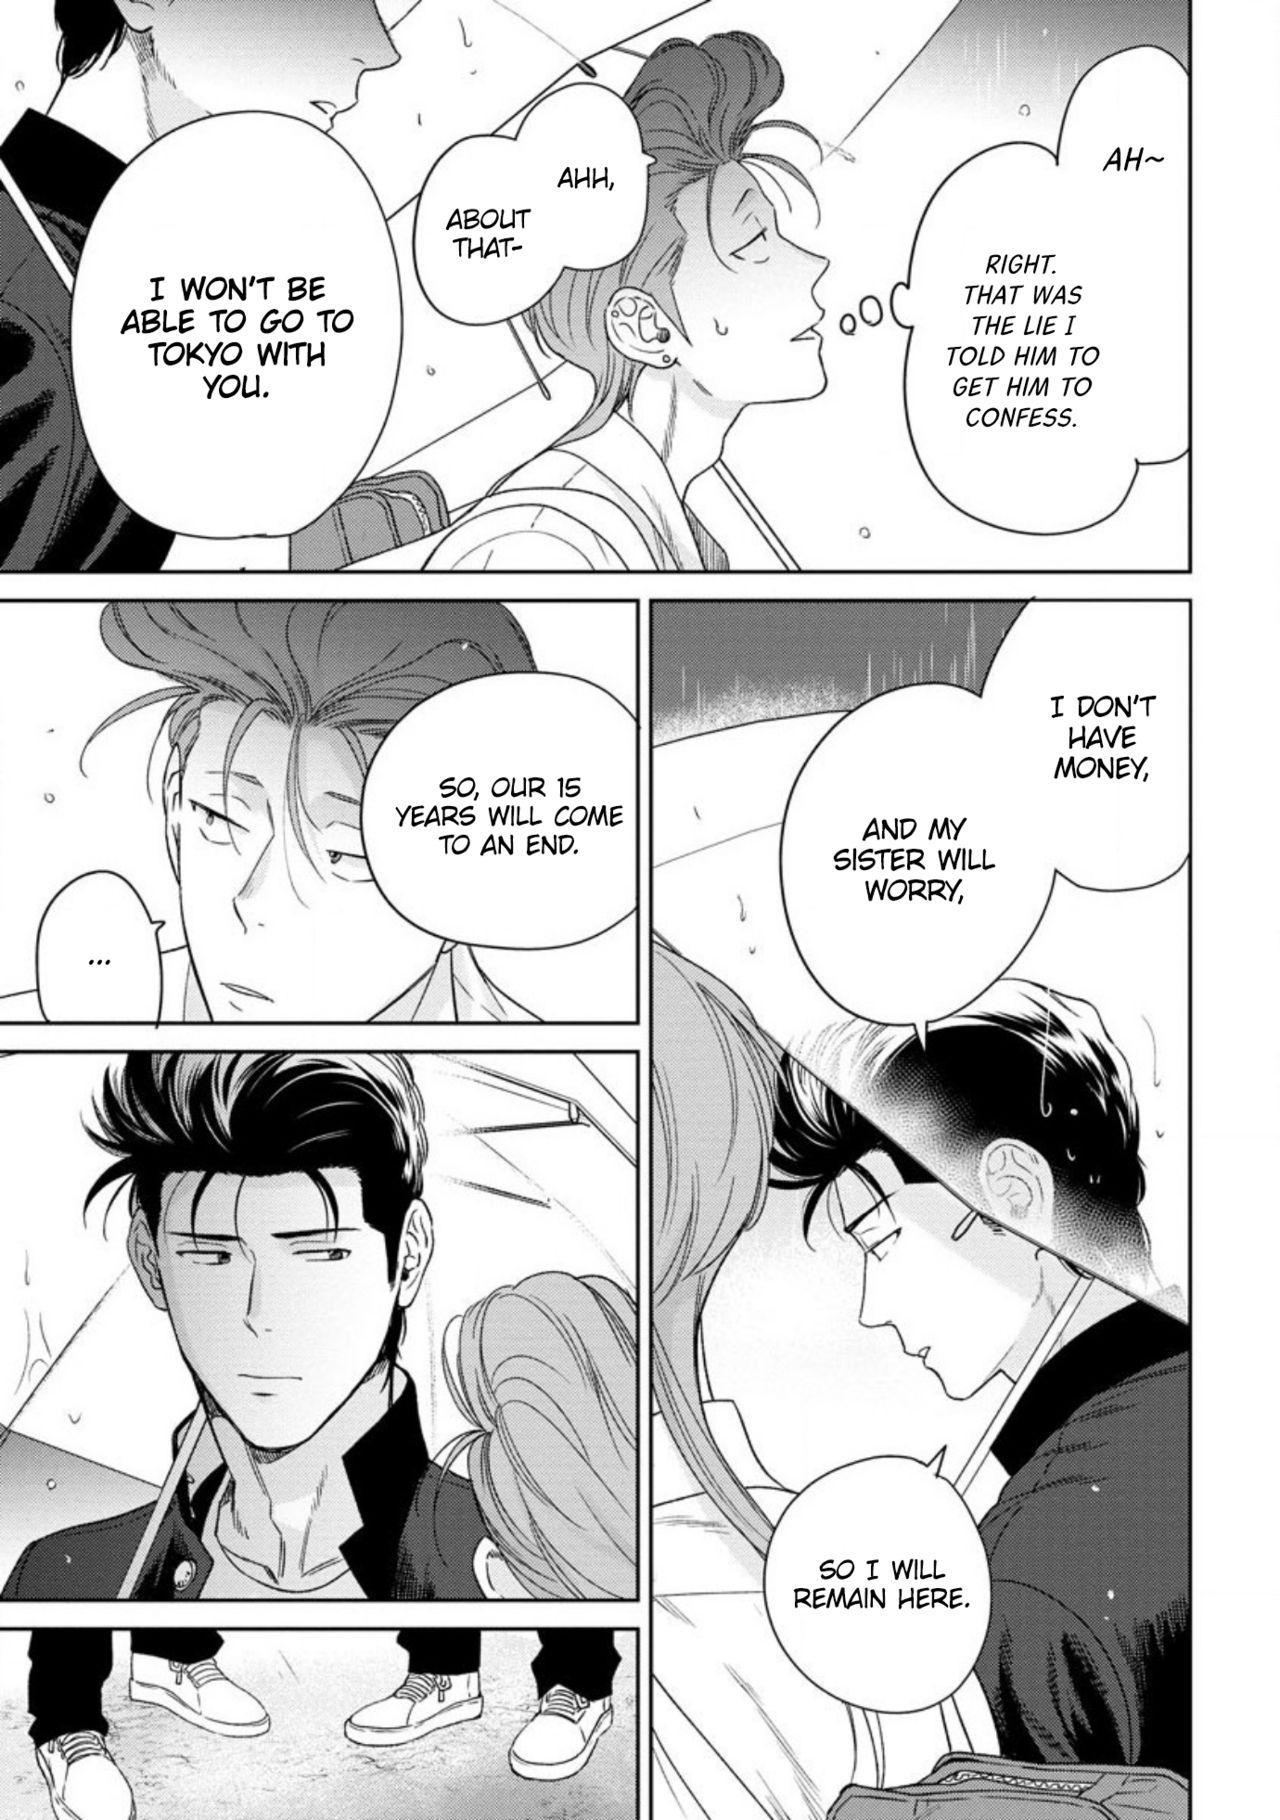 [Hiiragi Nozomu] Nakasete Yaru yo Yankee-kun   I'll Make You Cry Ch. 1-5 + Extras [English] [Digital] 169